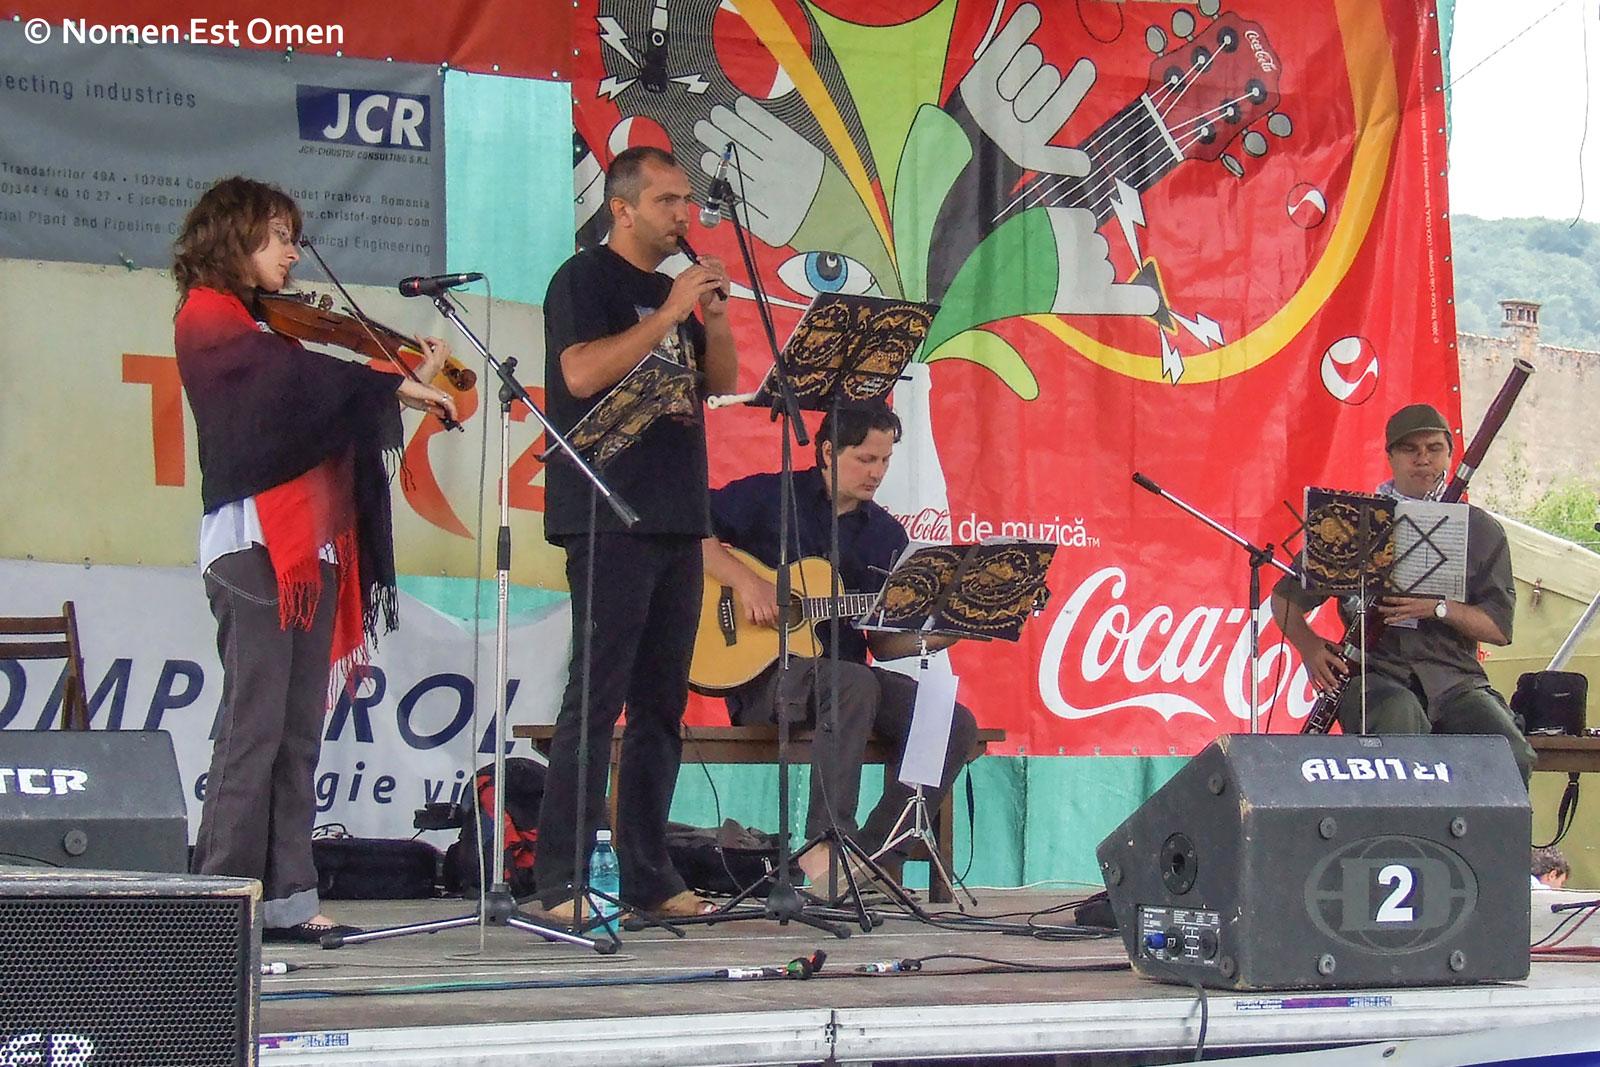 Nomen Est Omen 2008